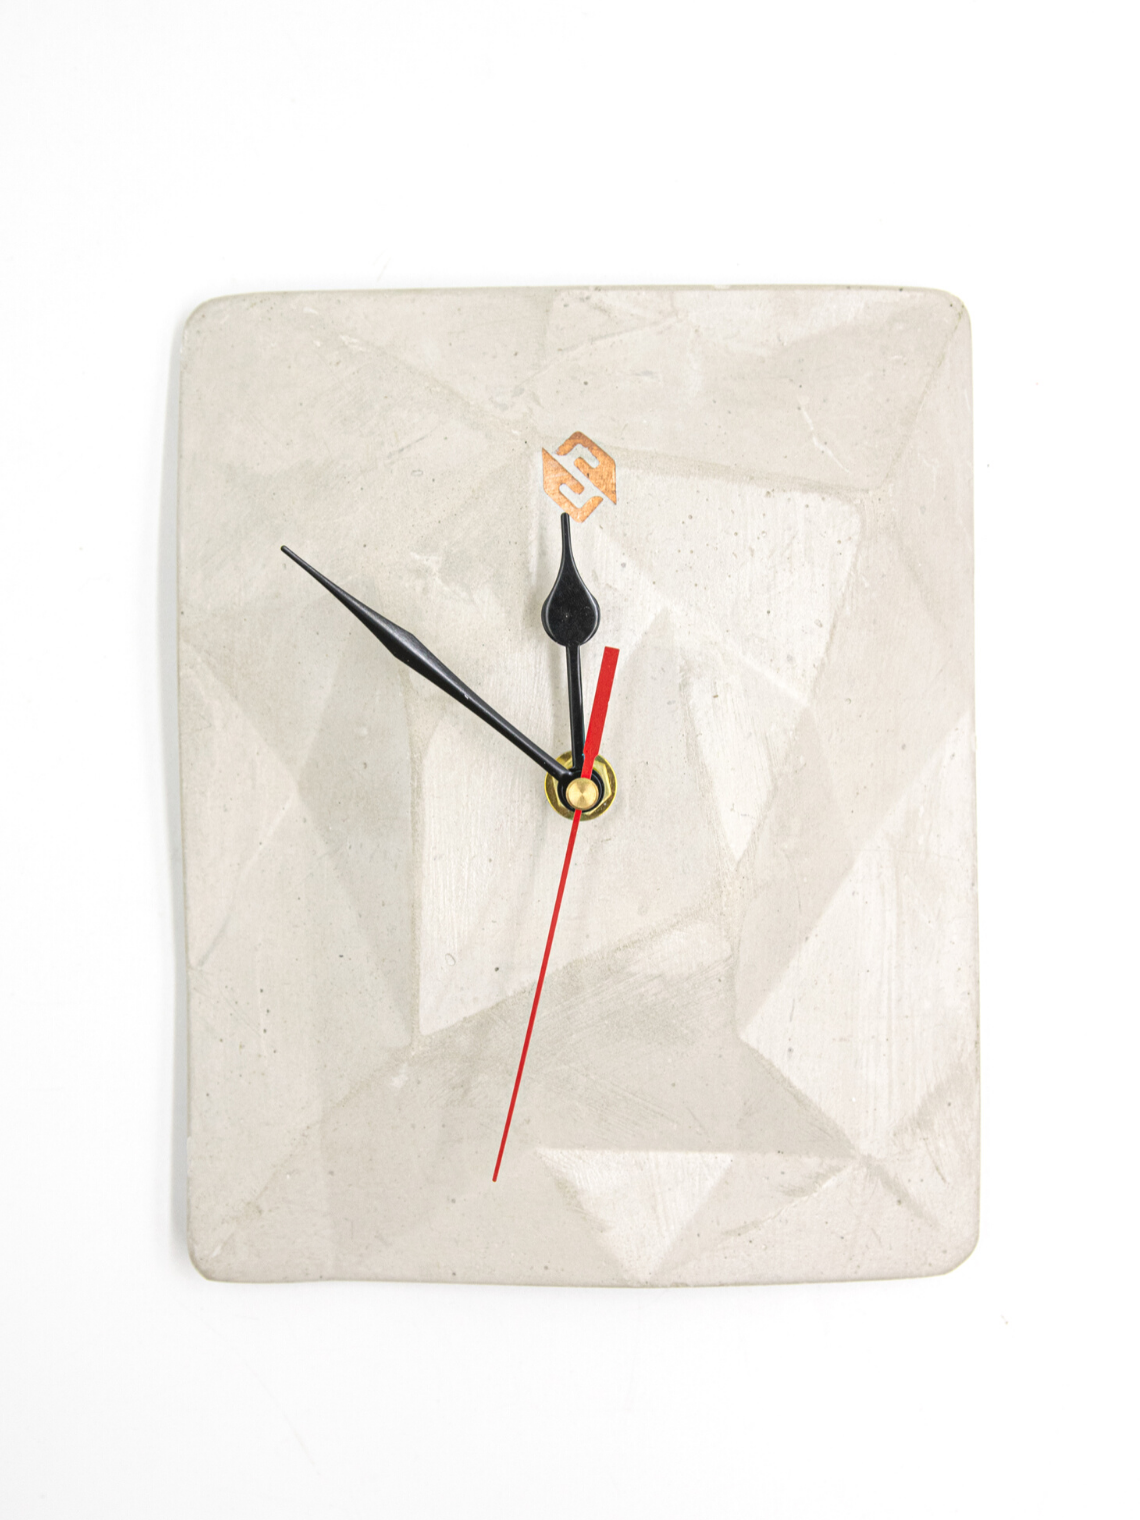 Reloj Abstracto pedestal